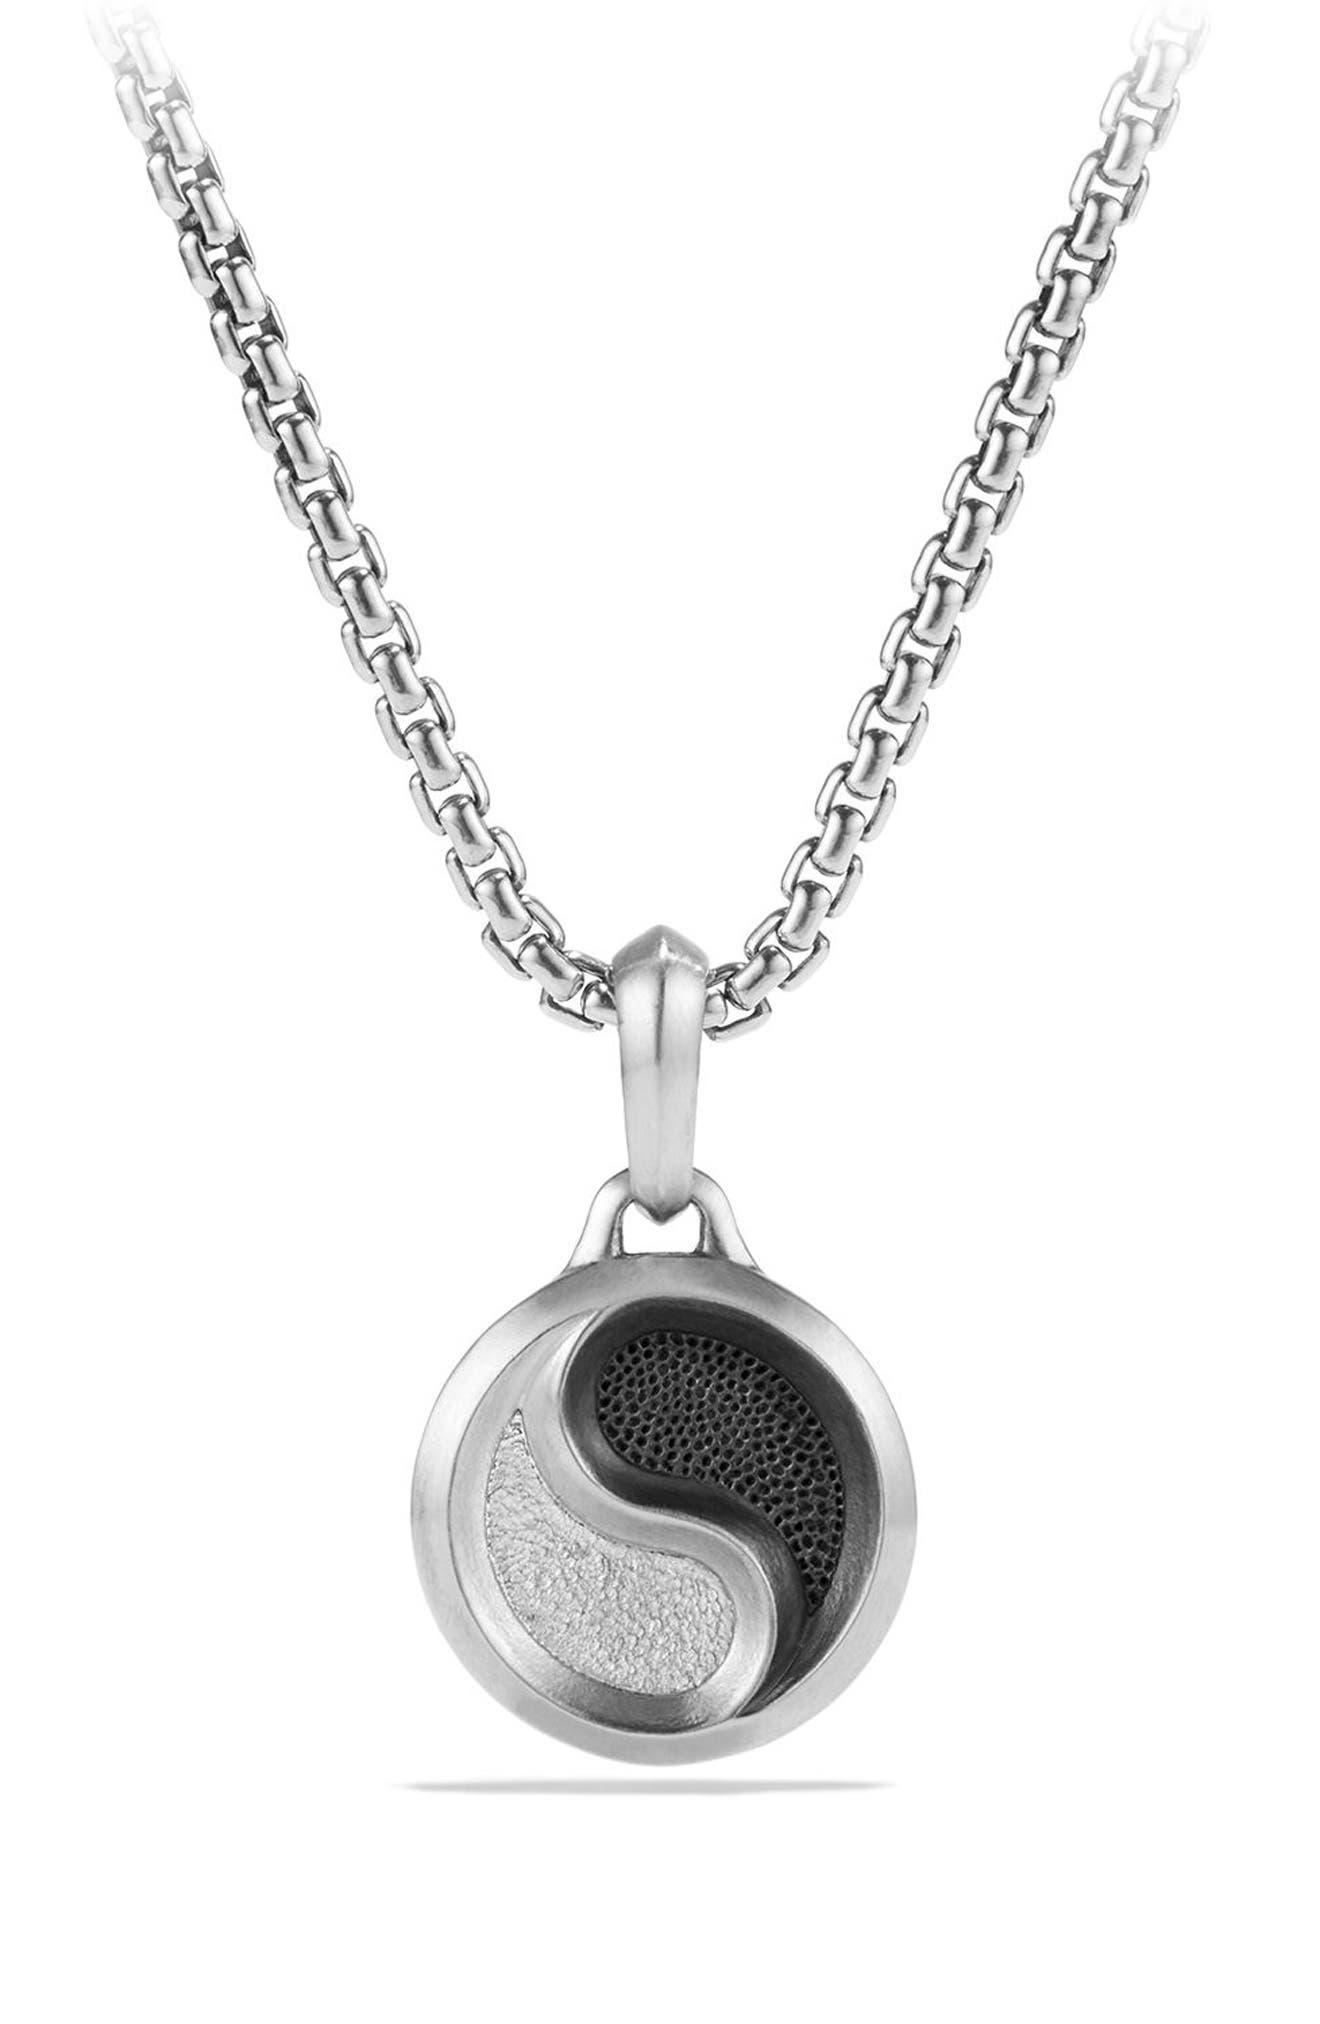 DAVID YURMAN Amulets Yin Yang Pendant